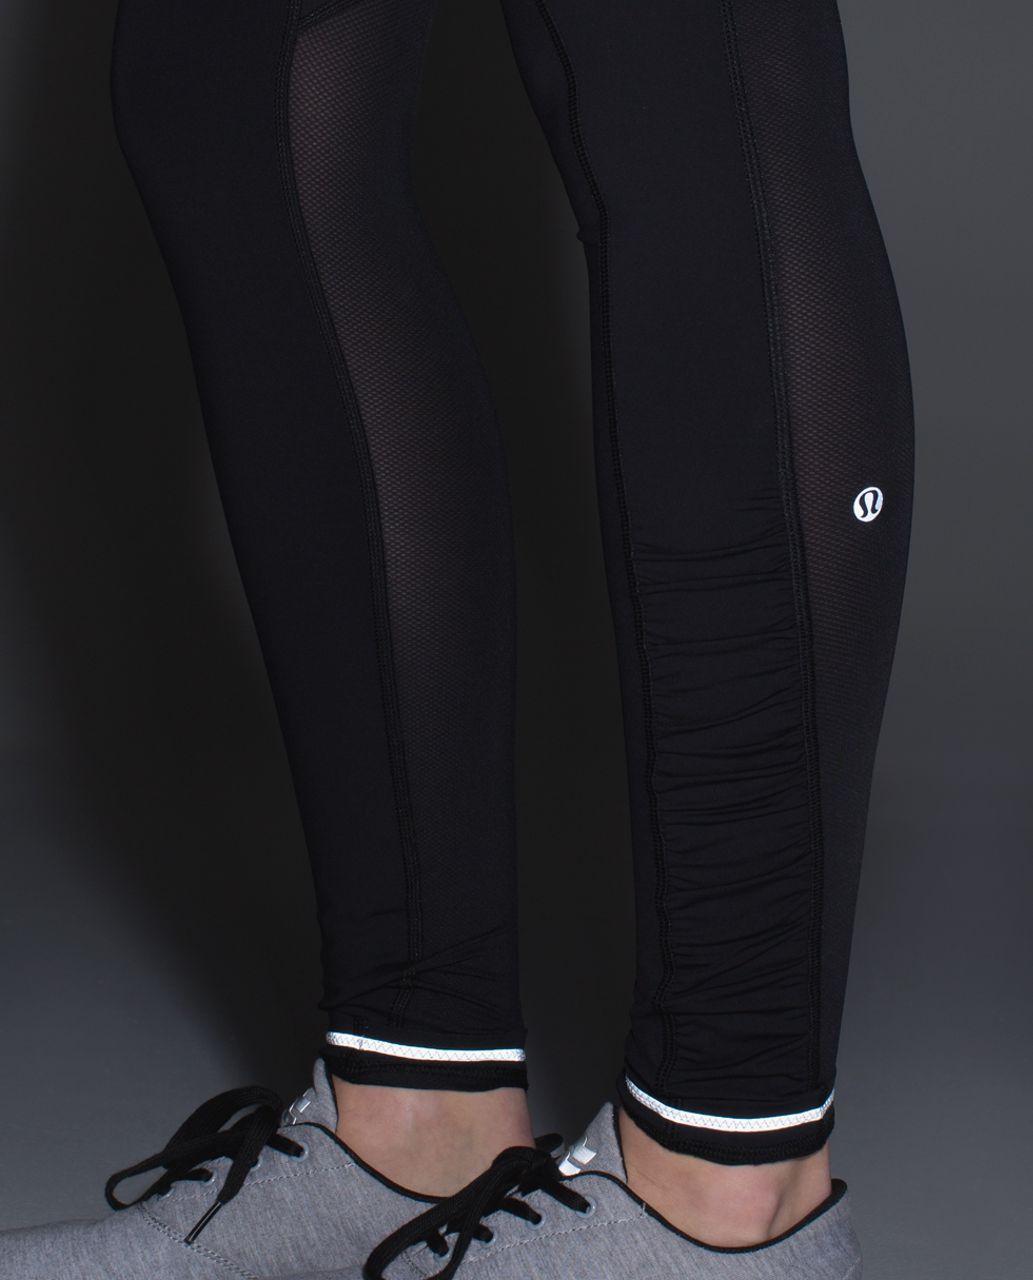 Lululemon Speed Tight III (Mesh) - Black / Heathered Black / Hyper Stripe Clear Mint Zest